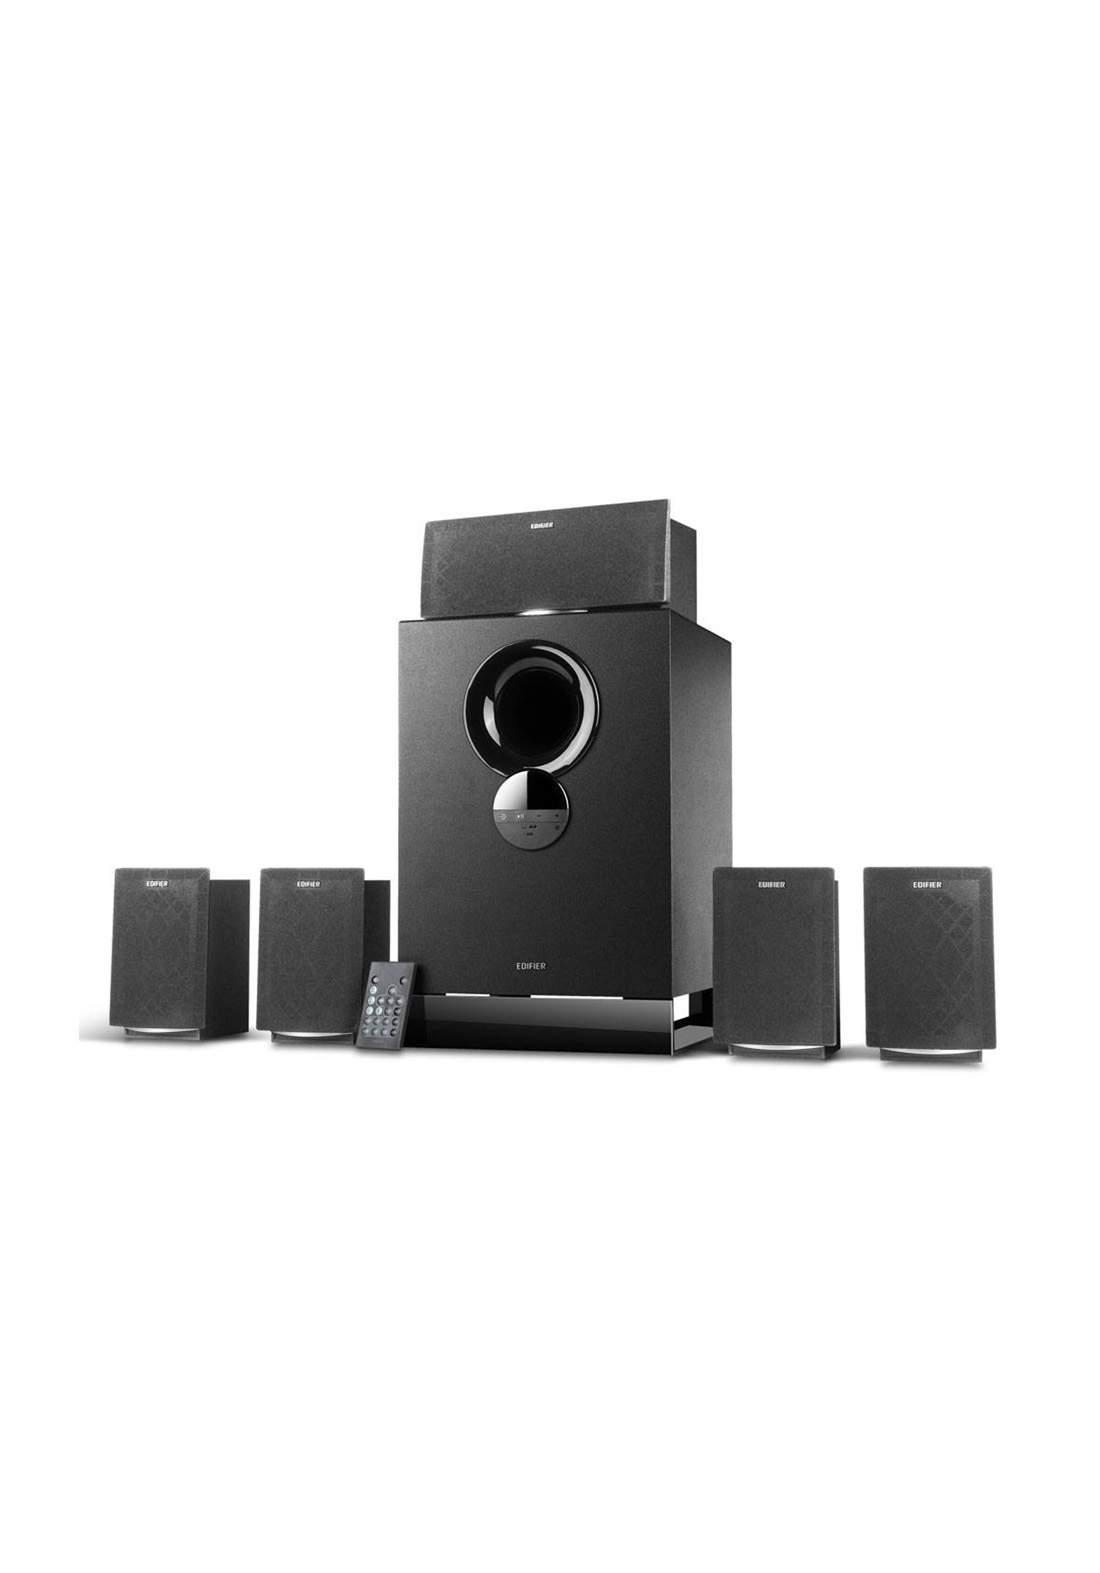 Edifier R501BT Versatile 5.1 Speaker System With Bluetooth - Black مضخم صوت